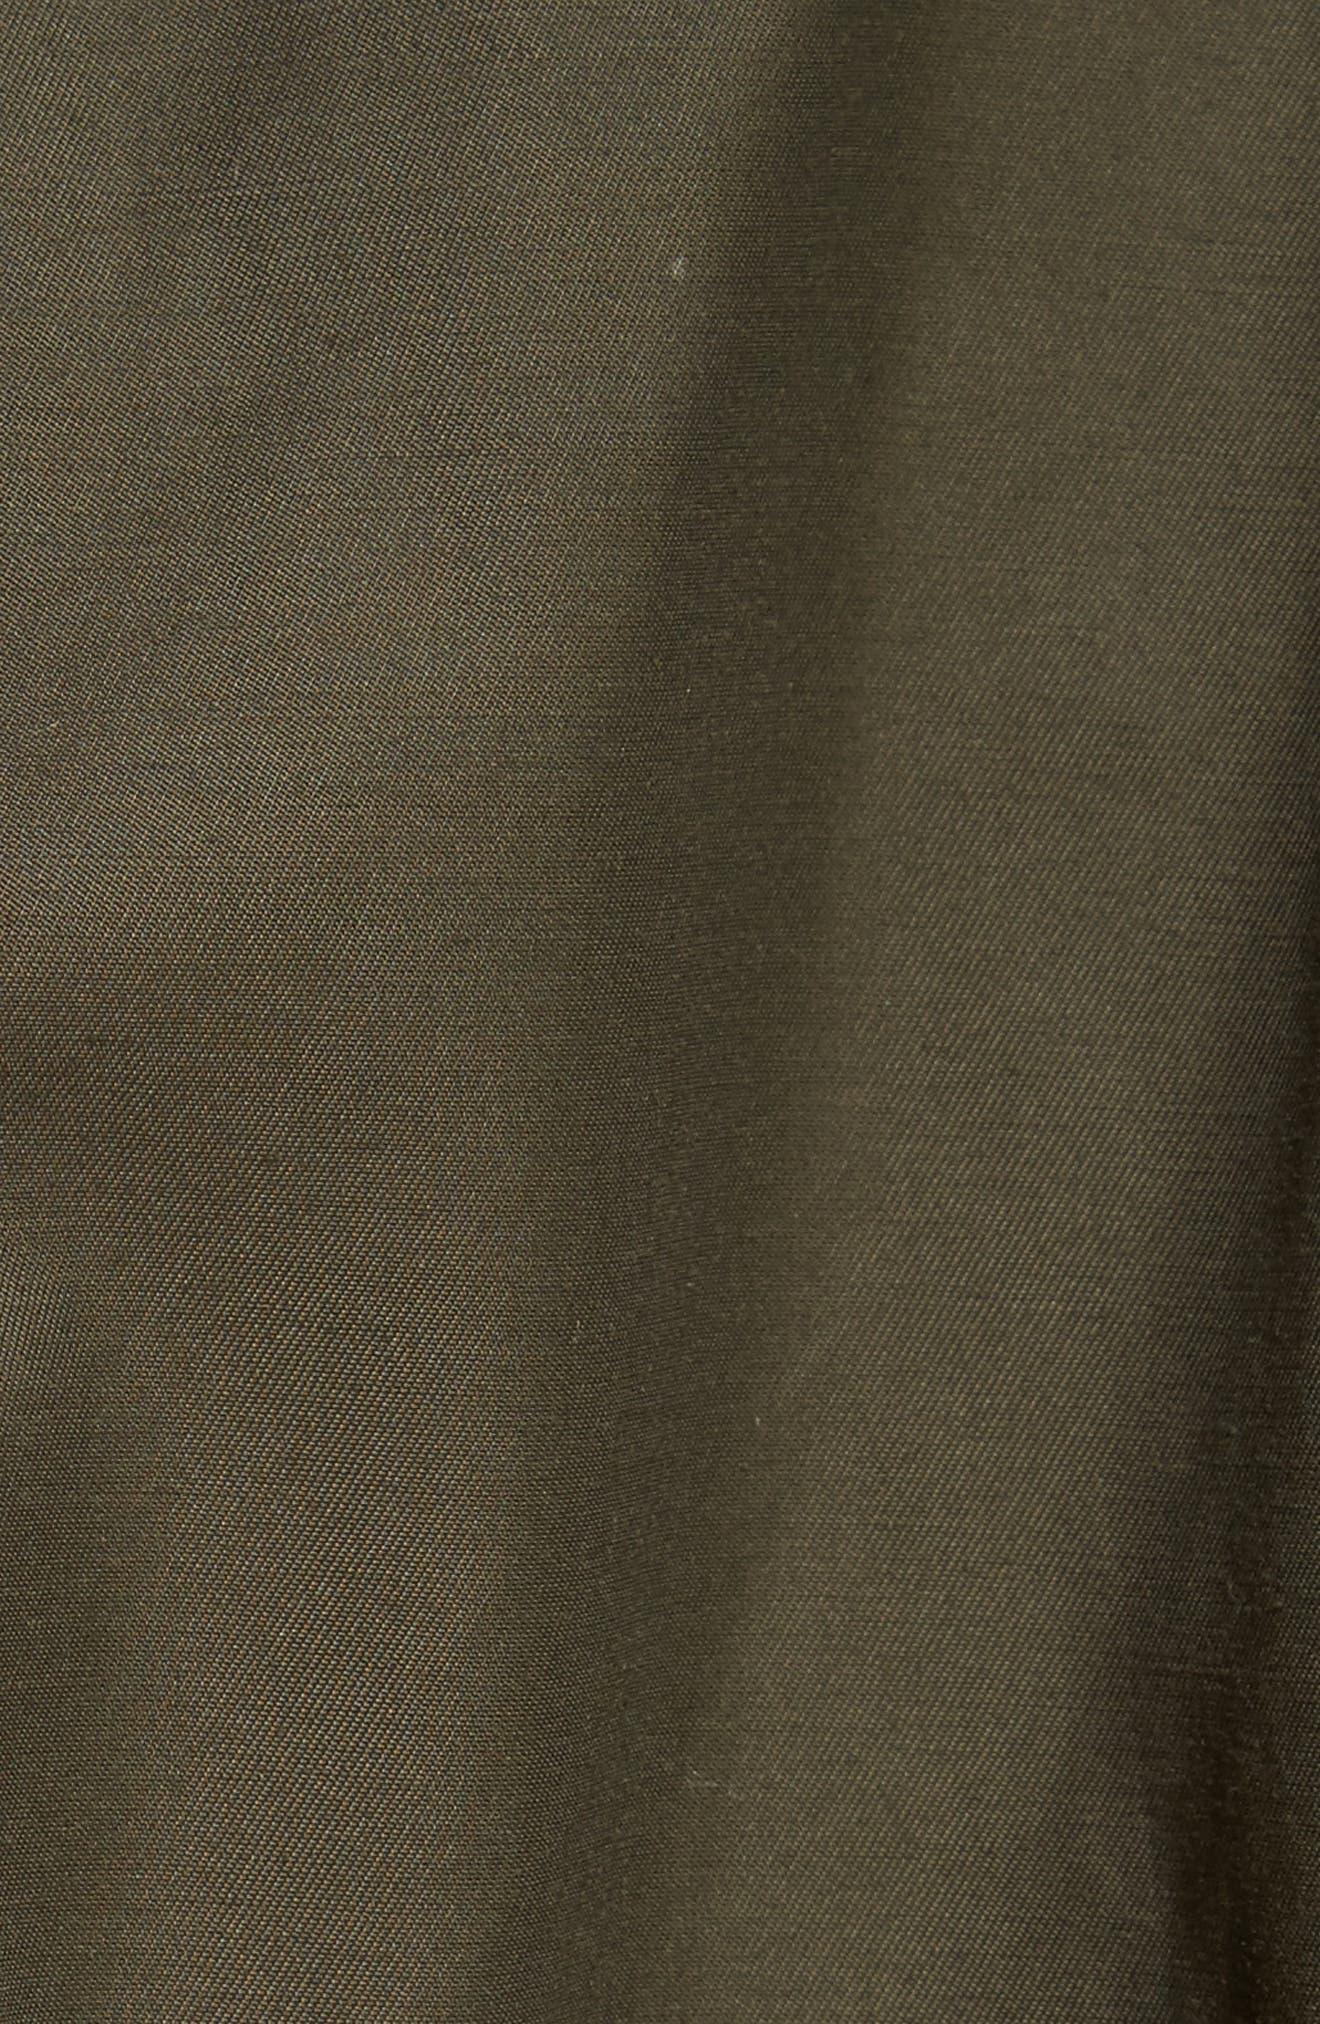 Sharya Technical Crisp Genuine Shearling Trim Parka,                             Alternate thumbnail 5, color,                             307